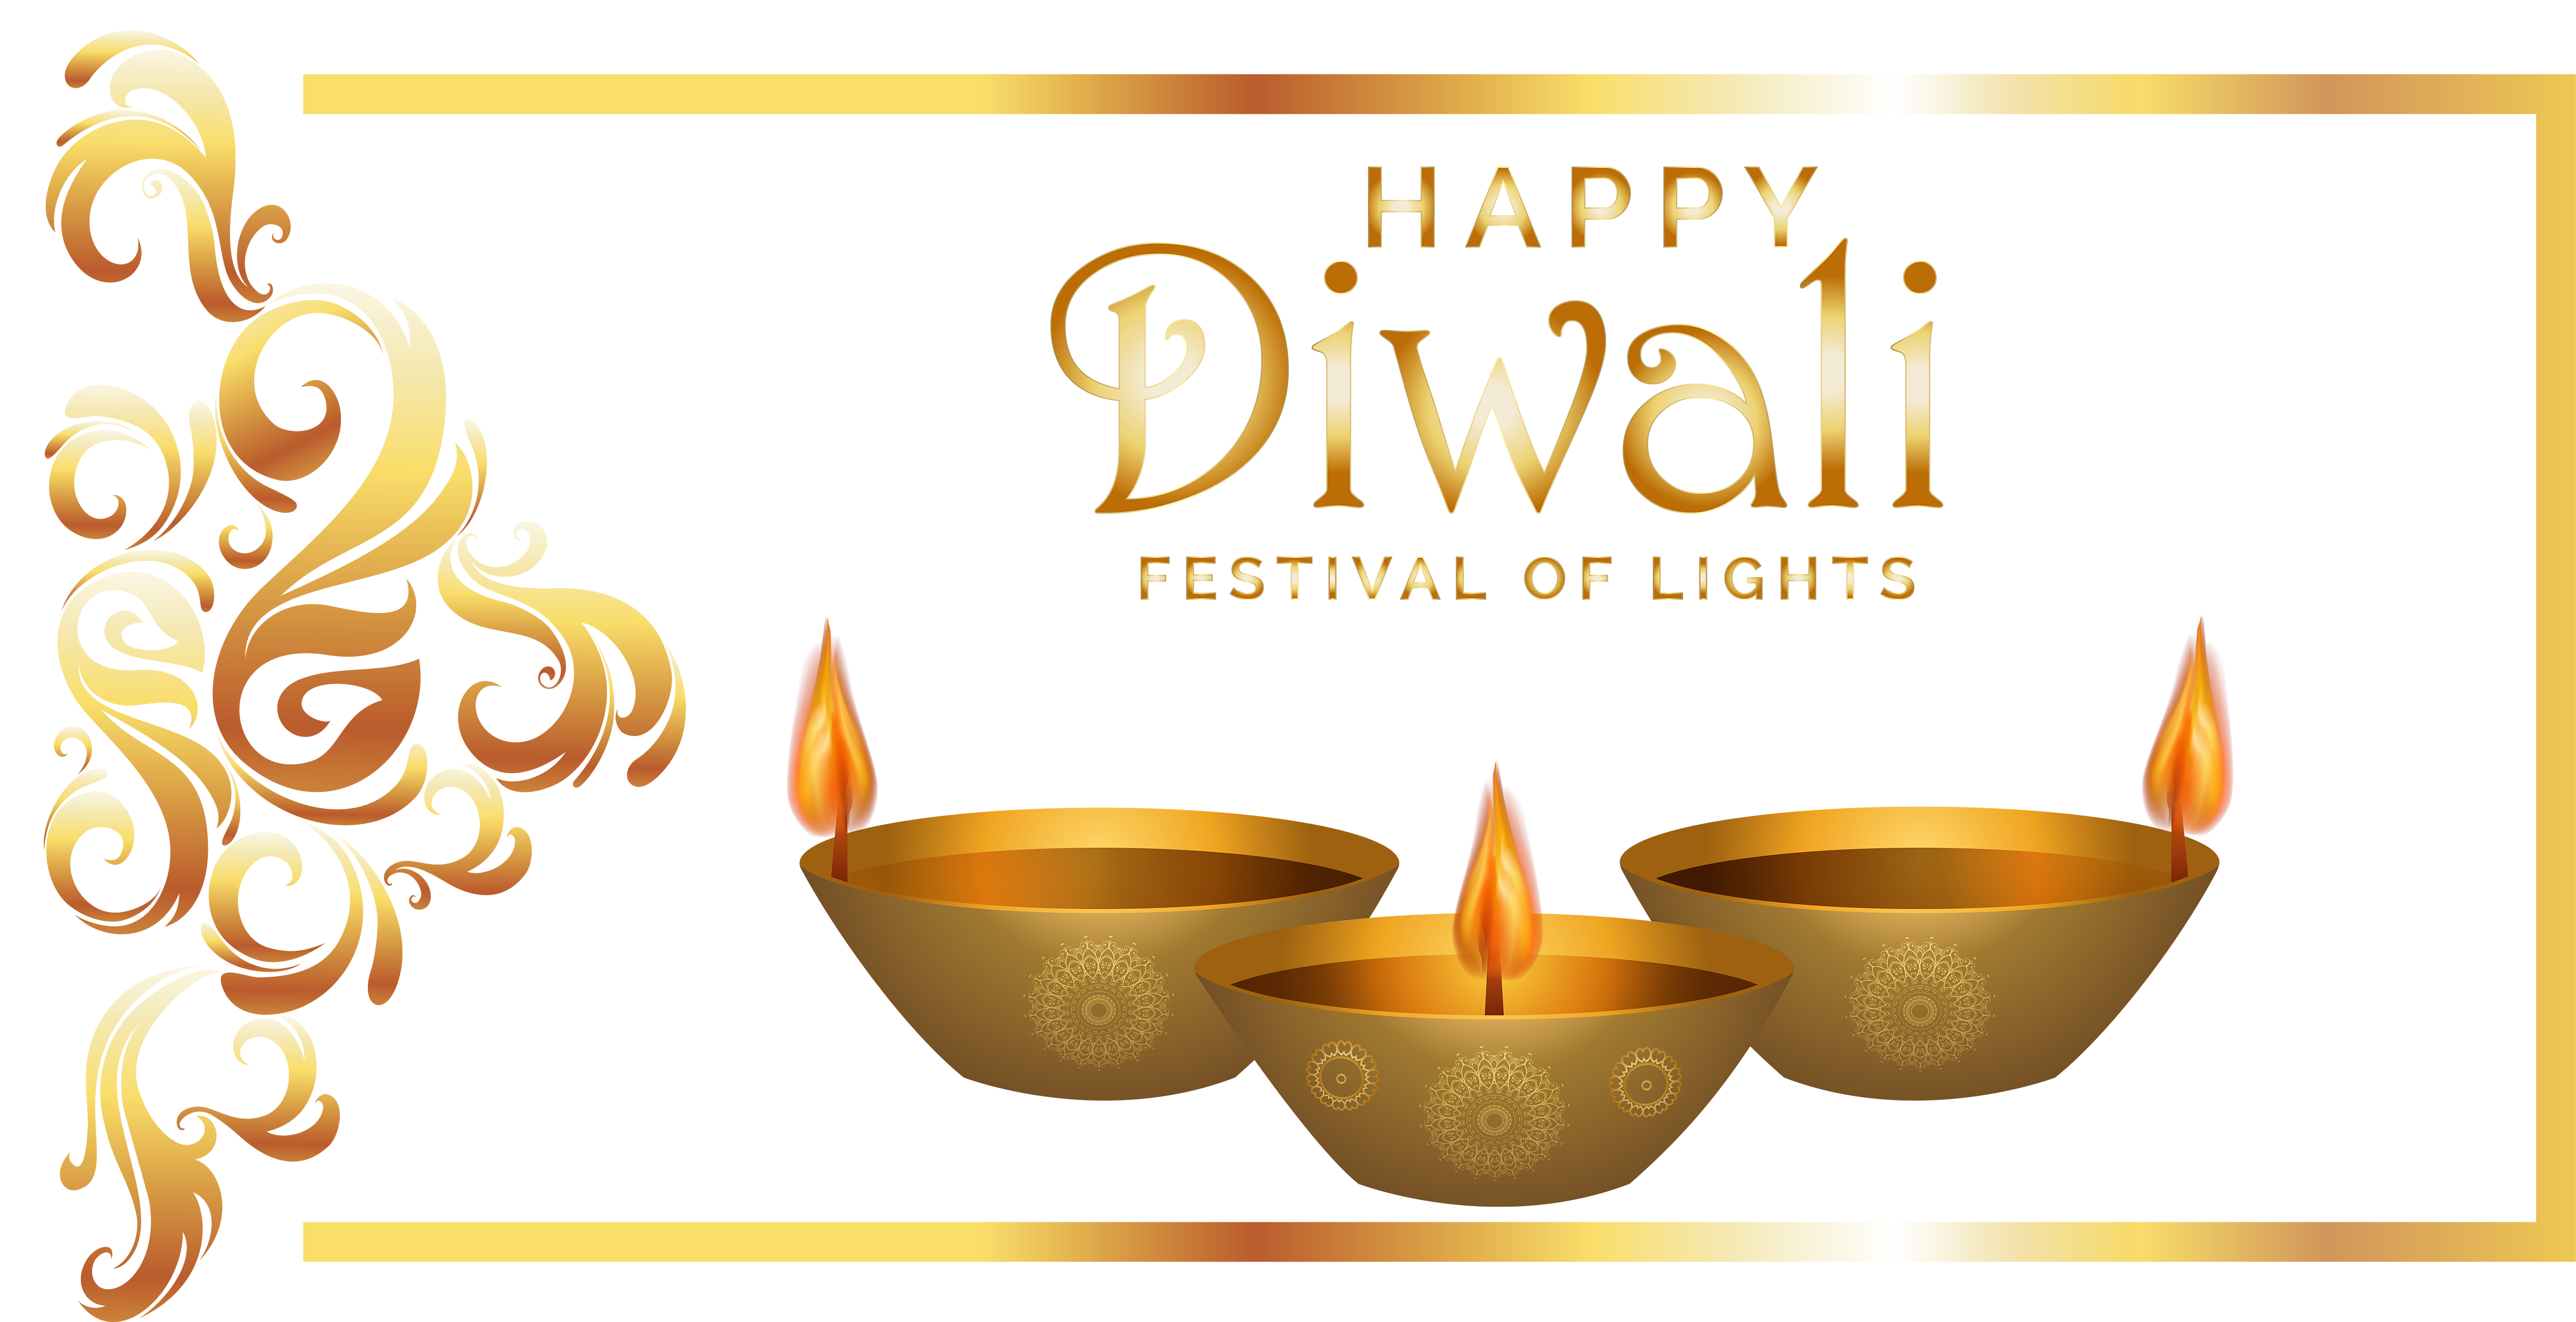 Happy Diwali PNG Image Background.